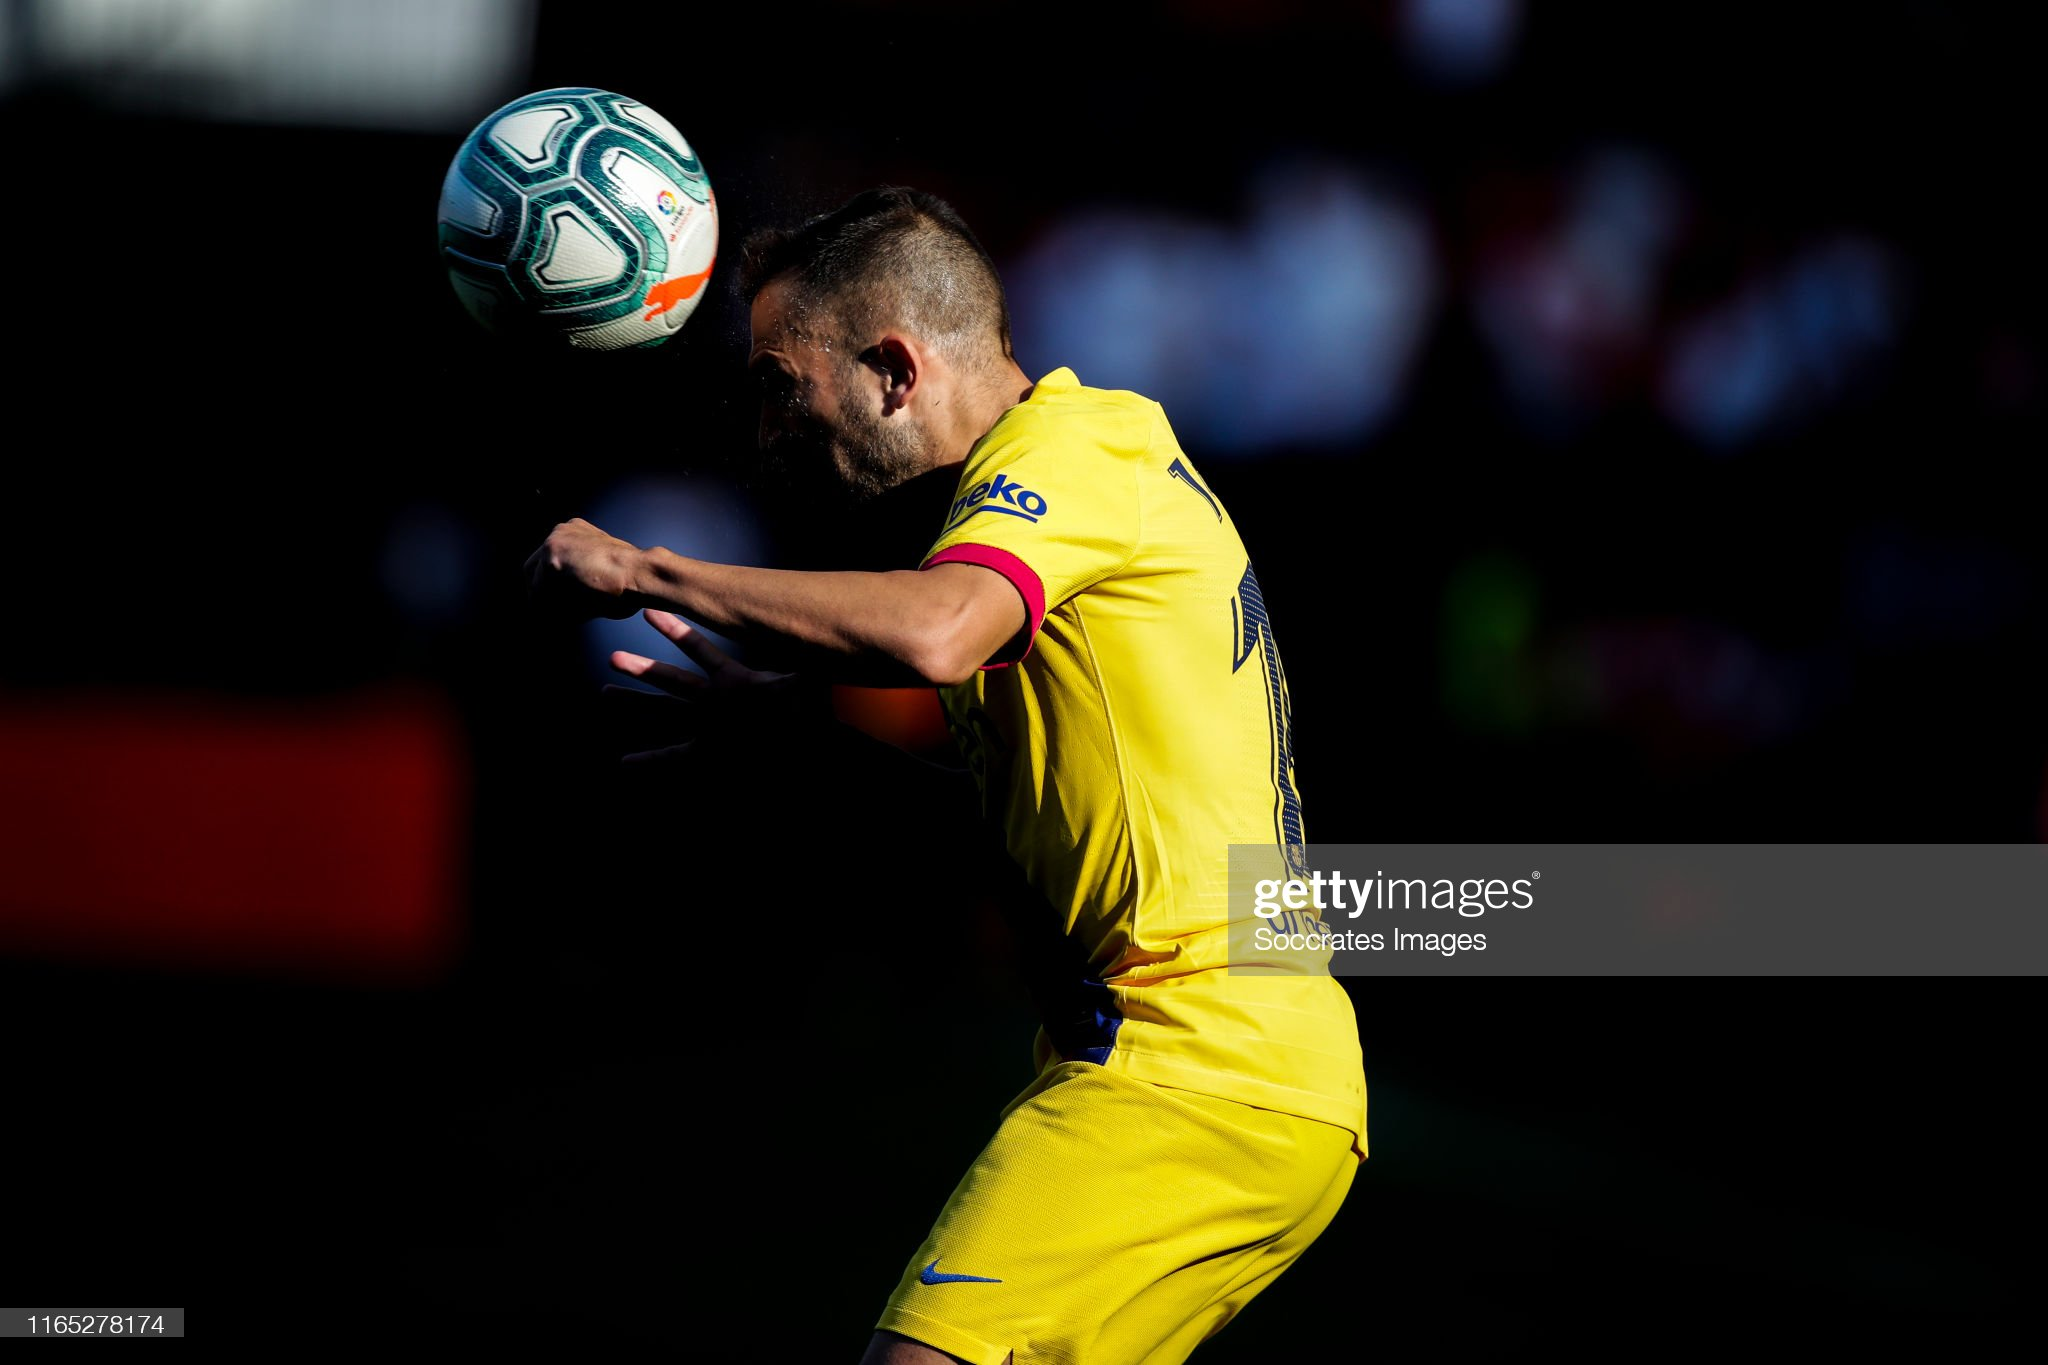 صور مباراة : أوساسونا - برشلونة 2-2 ( 31-08-2019 )  Jordi-alba-of-fc-barcelona-during-the-la-liga-santander-match-between-picture-id1165278174?s=2048x2048